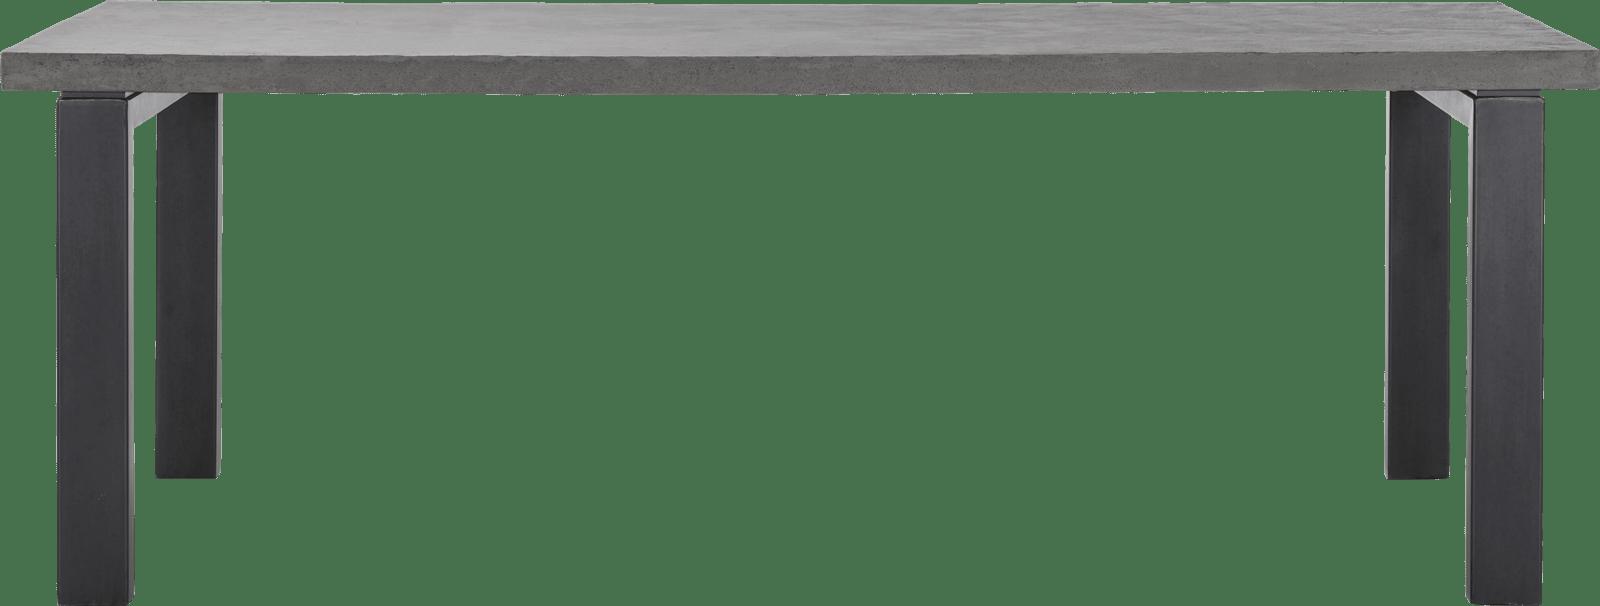 XOOON - Toro - Industriel - table 250 x 90 cm